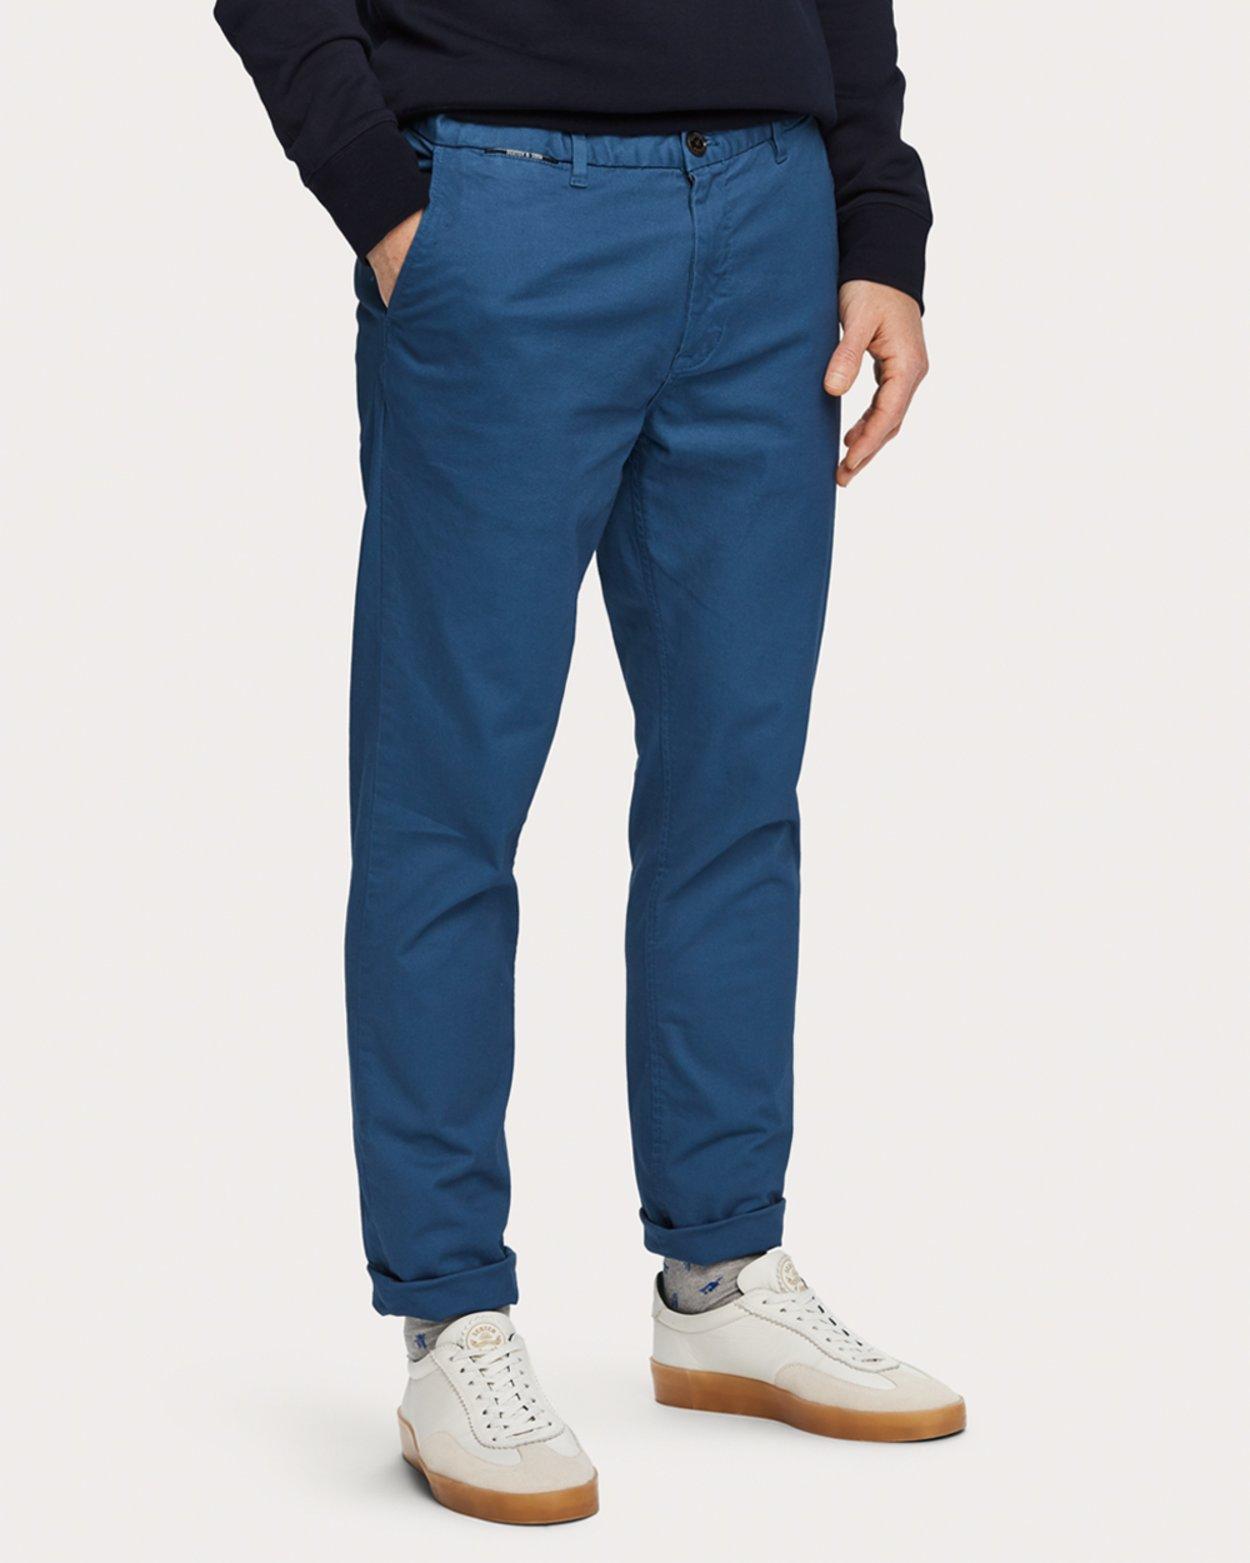 Stuart Classic Chinos - Worker Blue